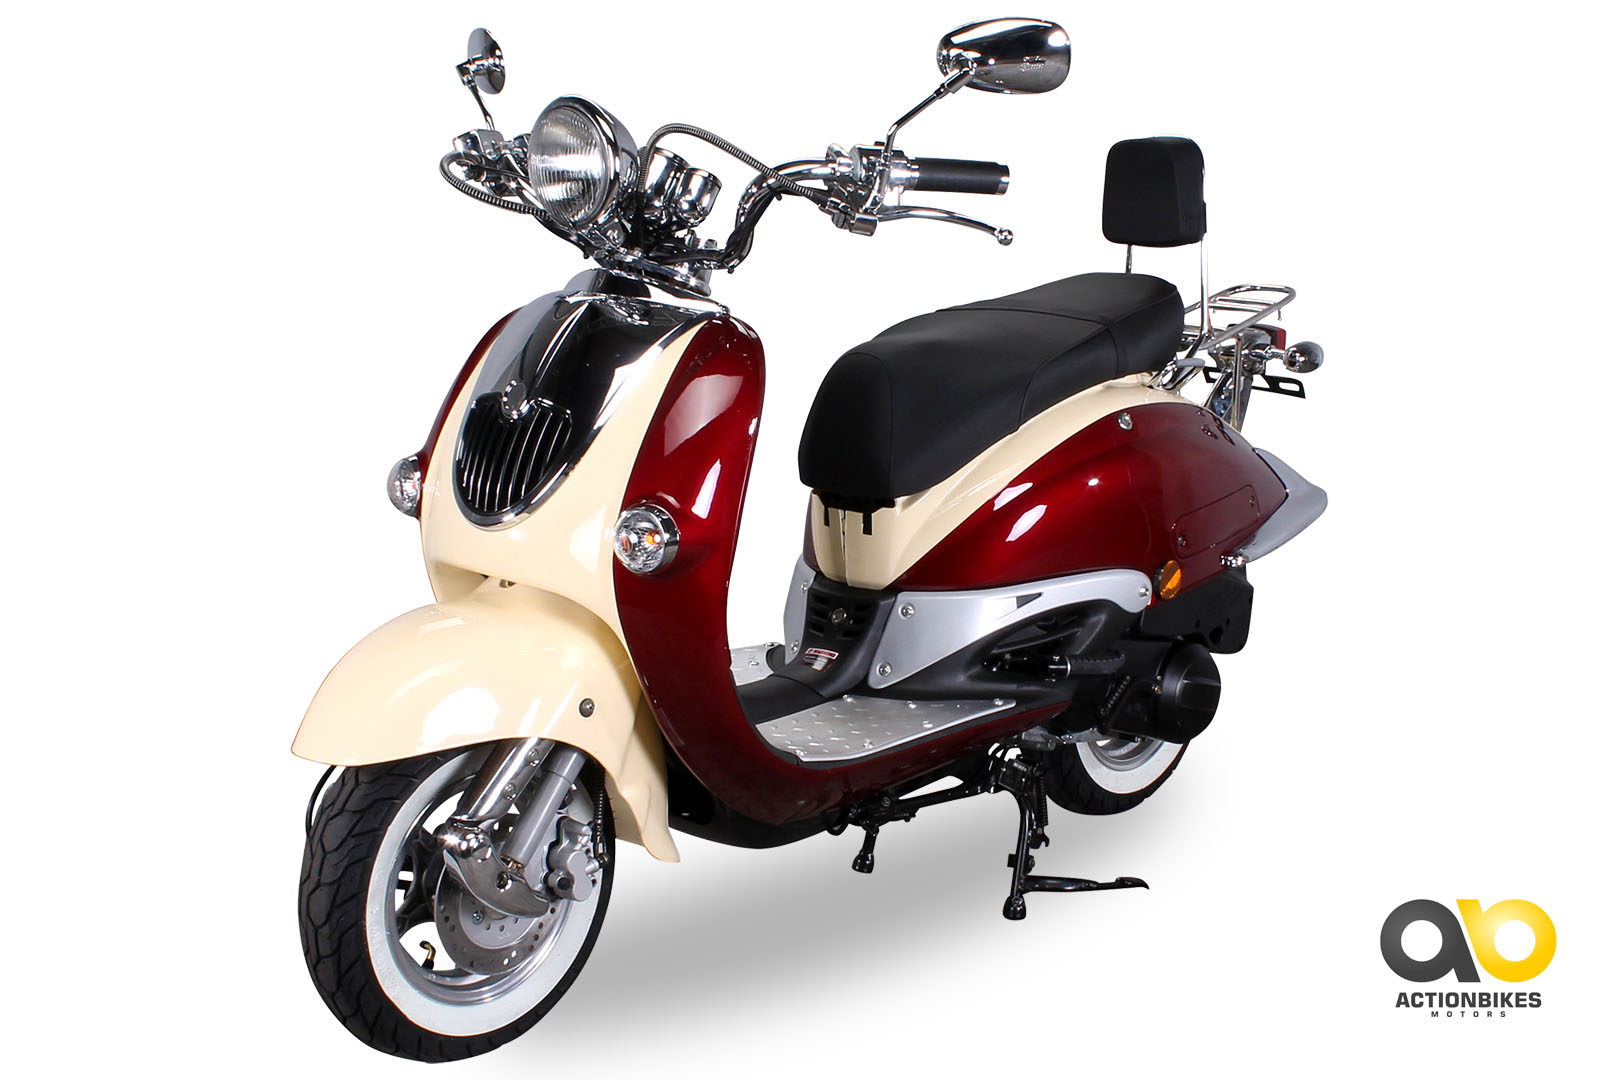 znen retro roller zn125 h motorroller 125 cc retroroller. Black Bedroom Furniture Sets. Home Design Ideas